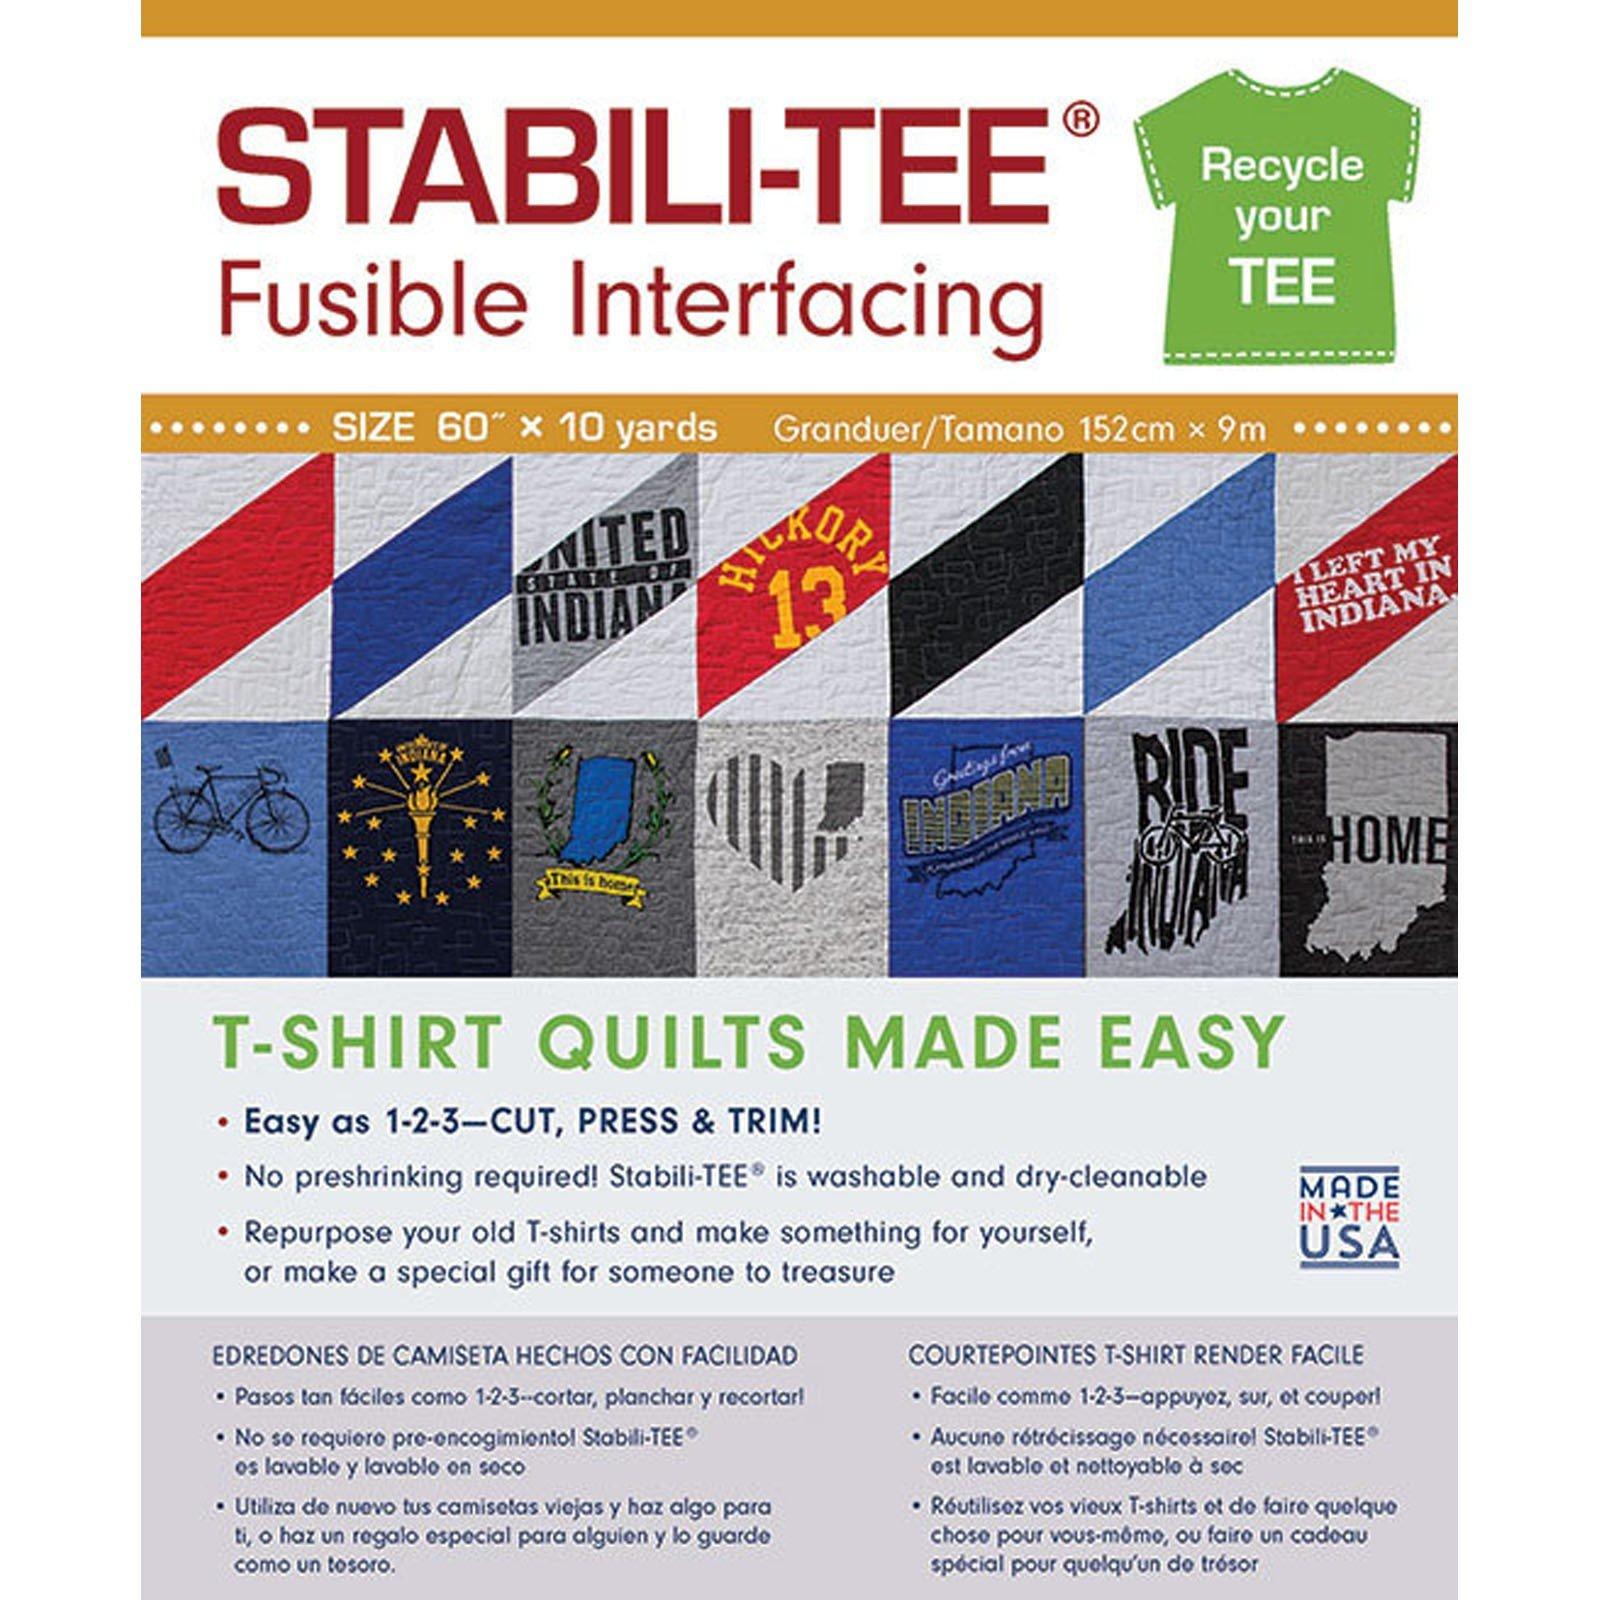 Stabili-Tee Fusible Interfacing<br/>C&T Publishing